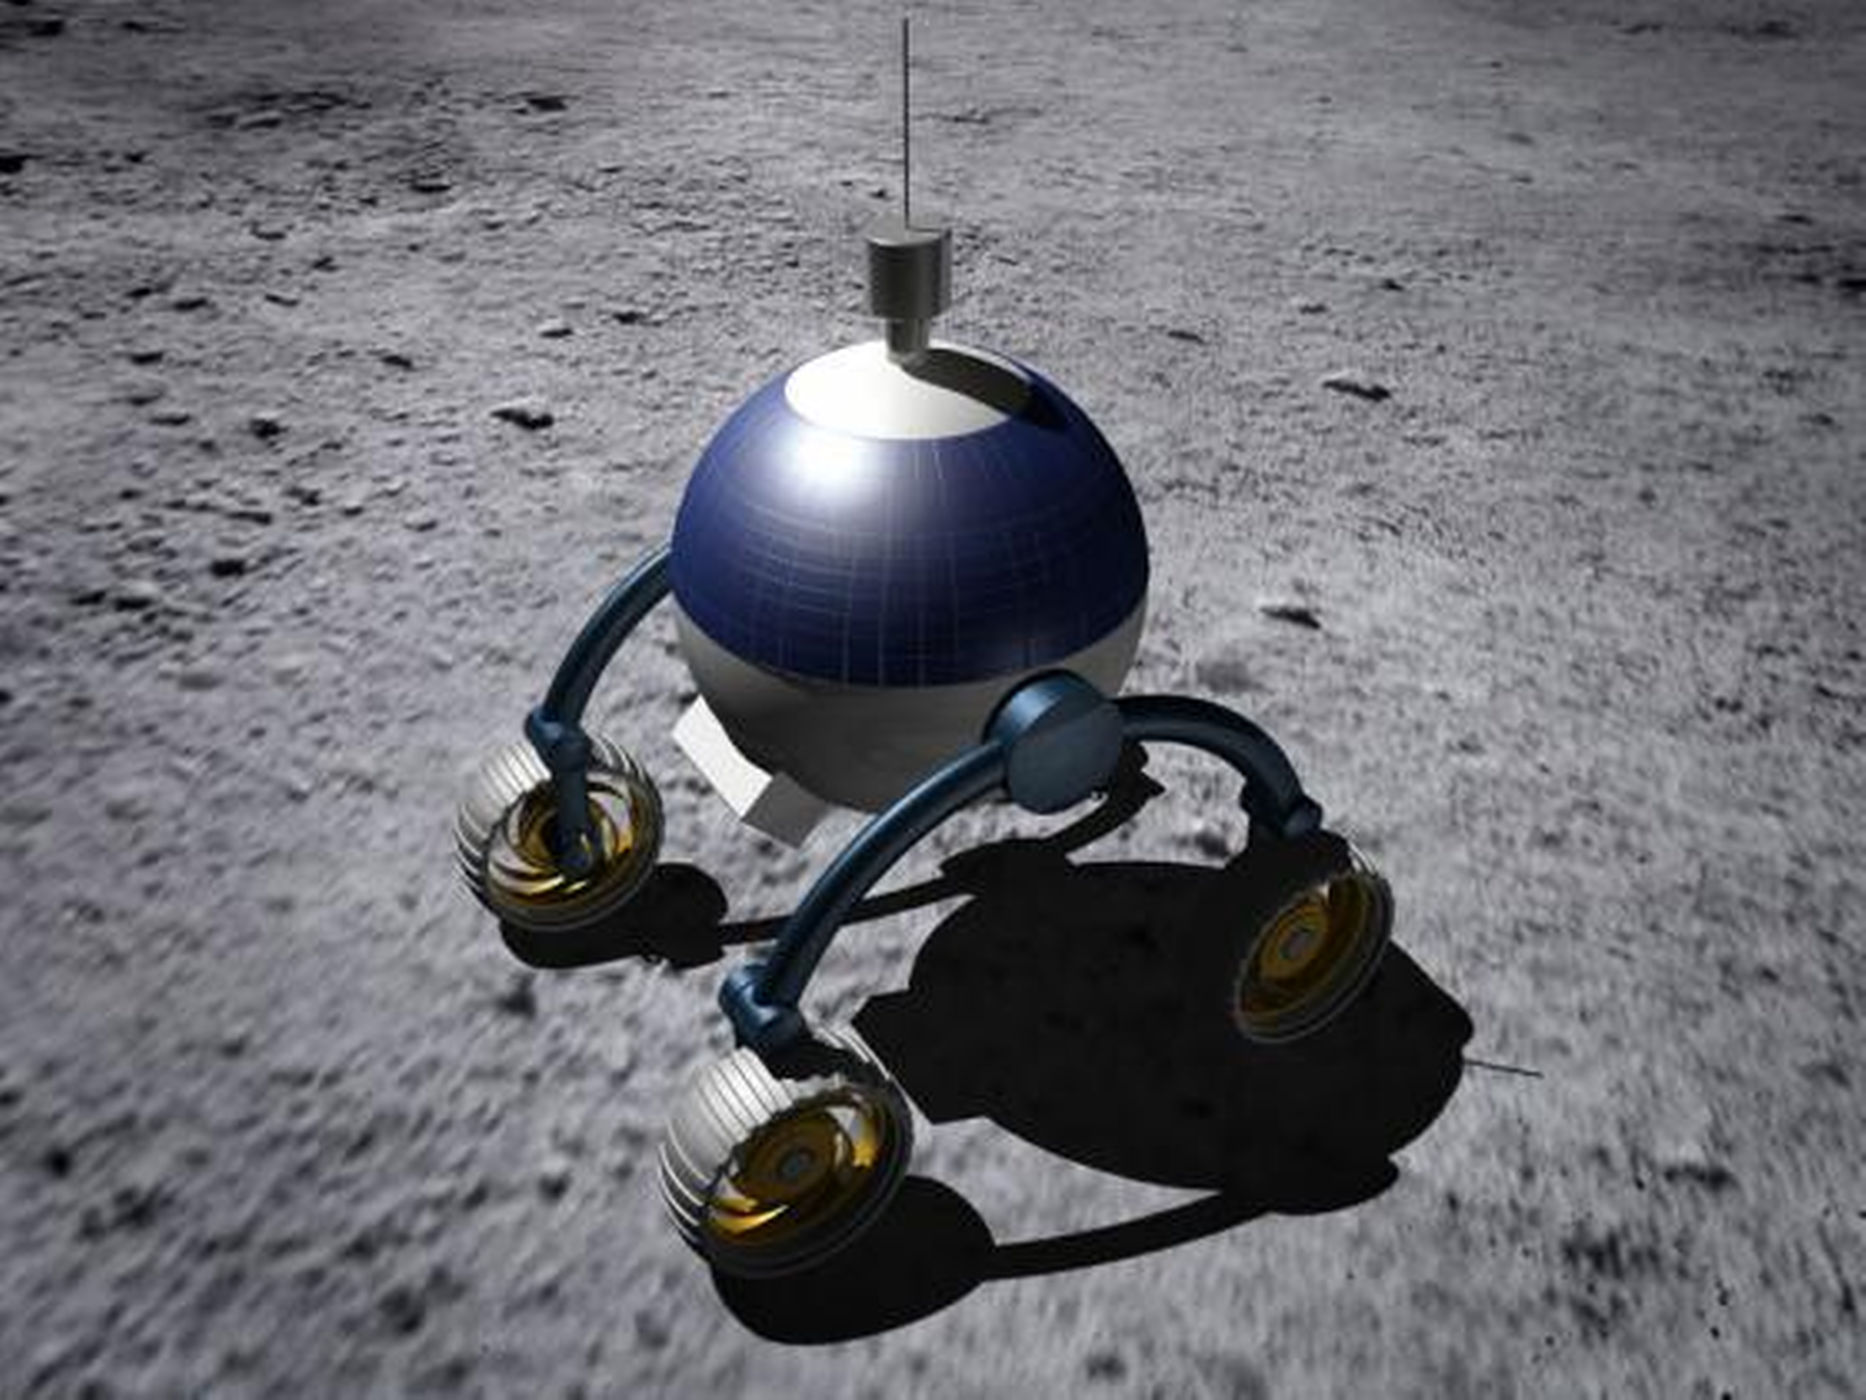 google-lunar-x-prize-synergy-moon.jpg